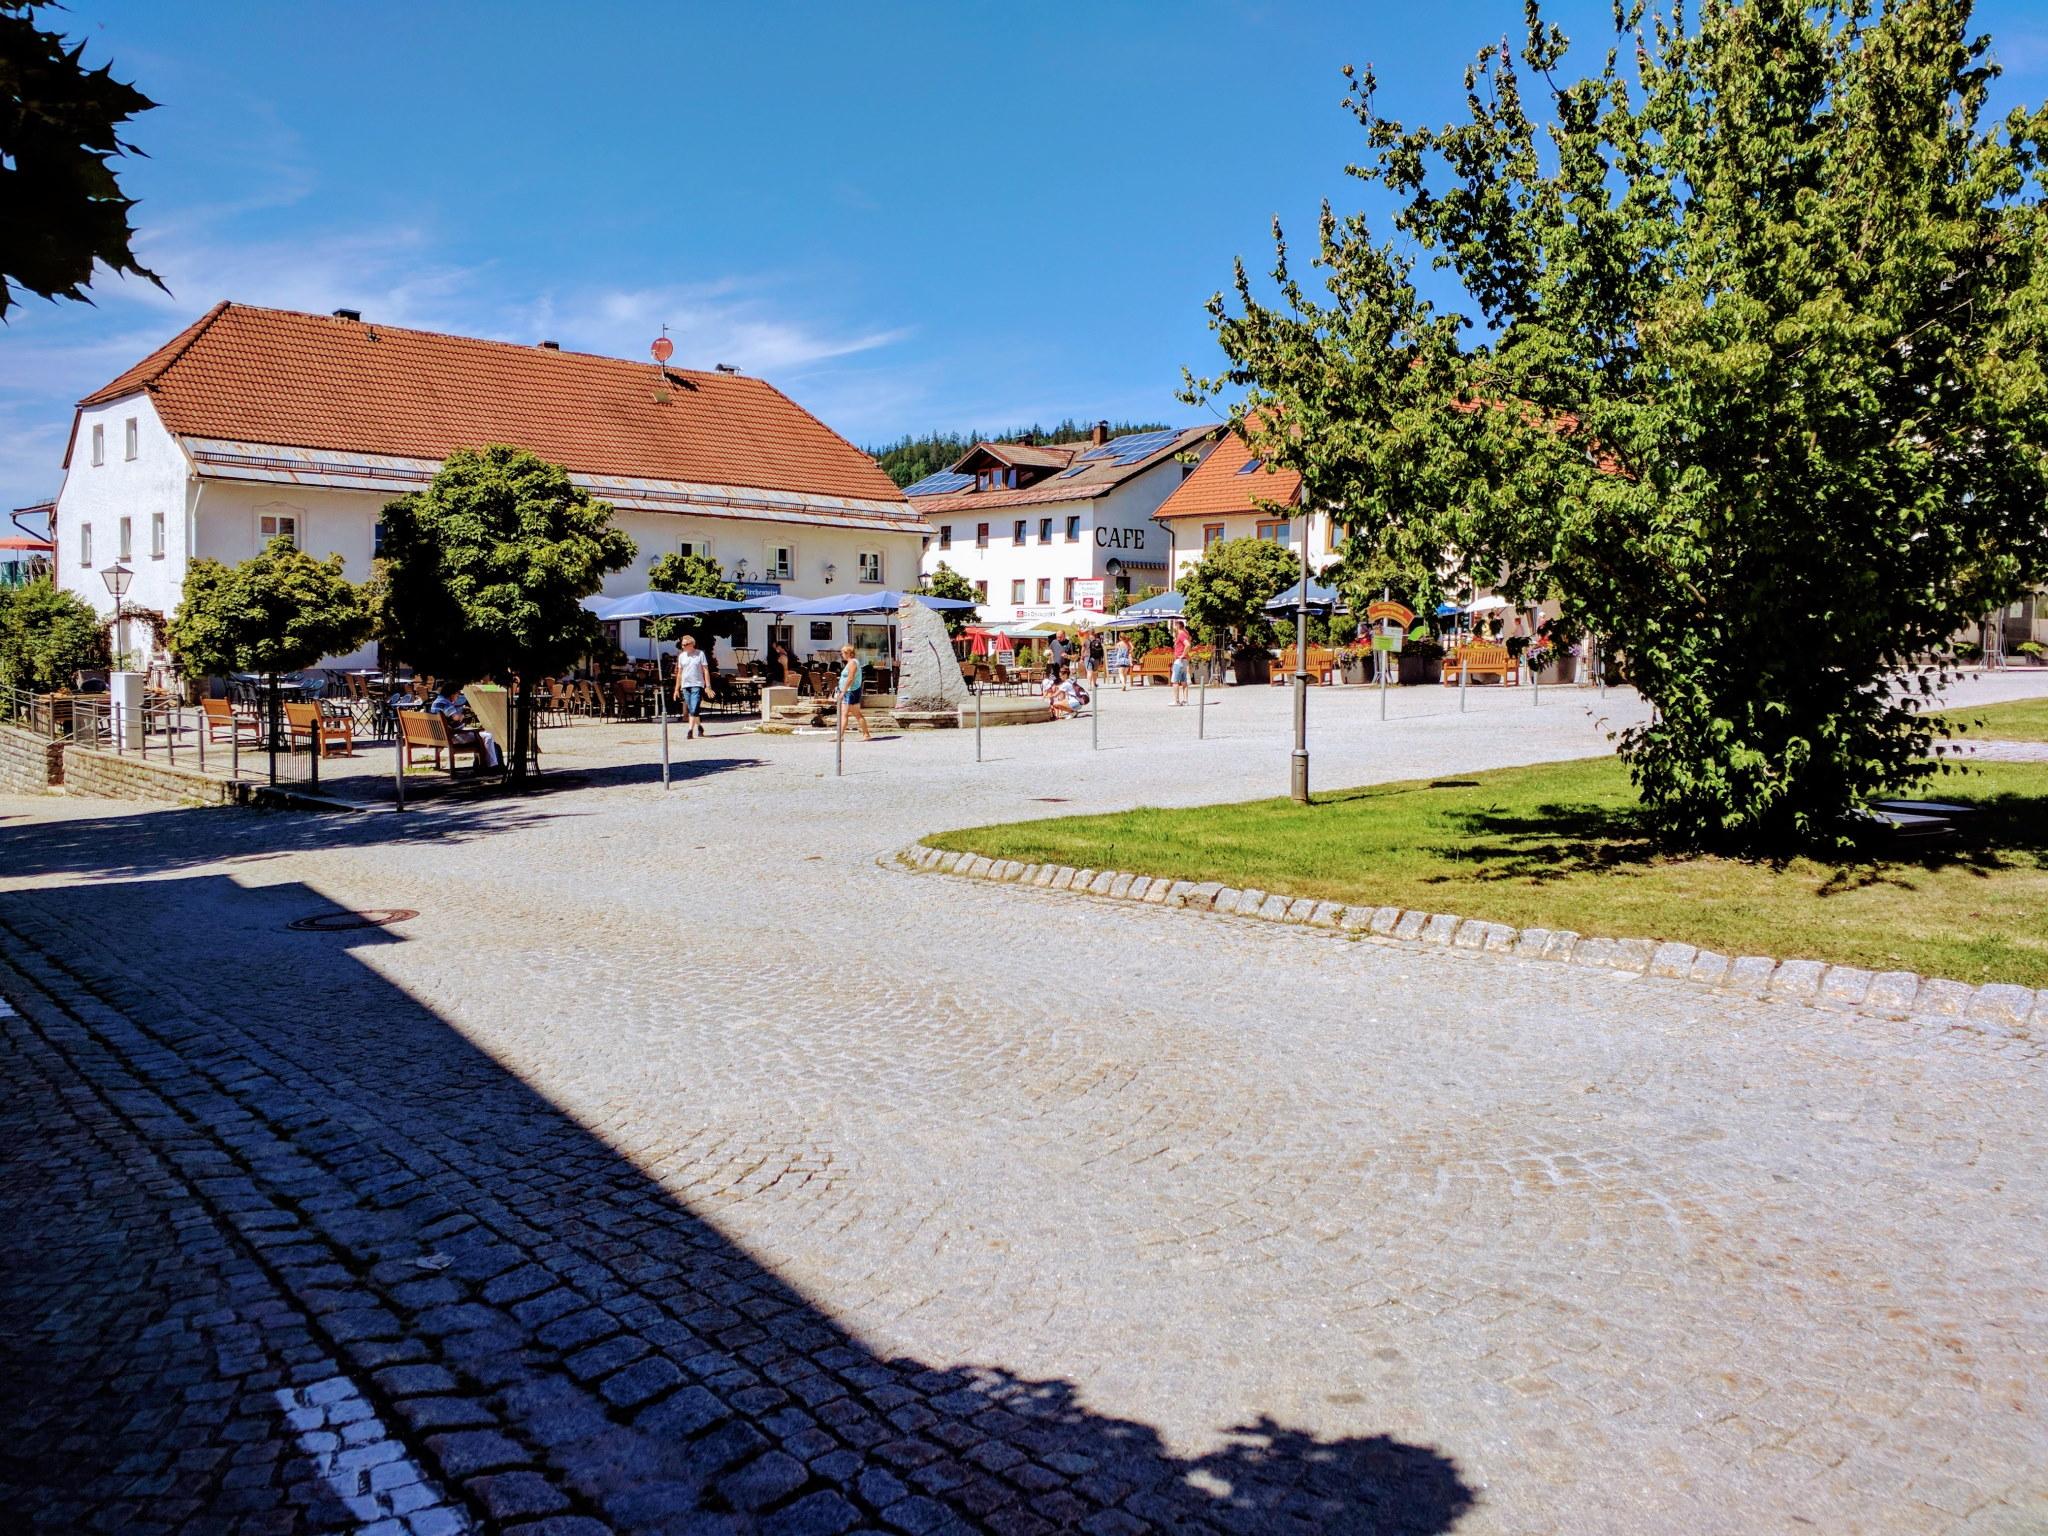 Marktplatz in Bodenmais